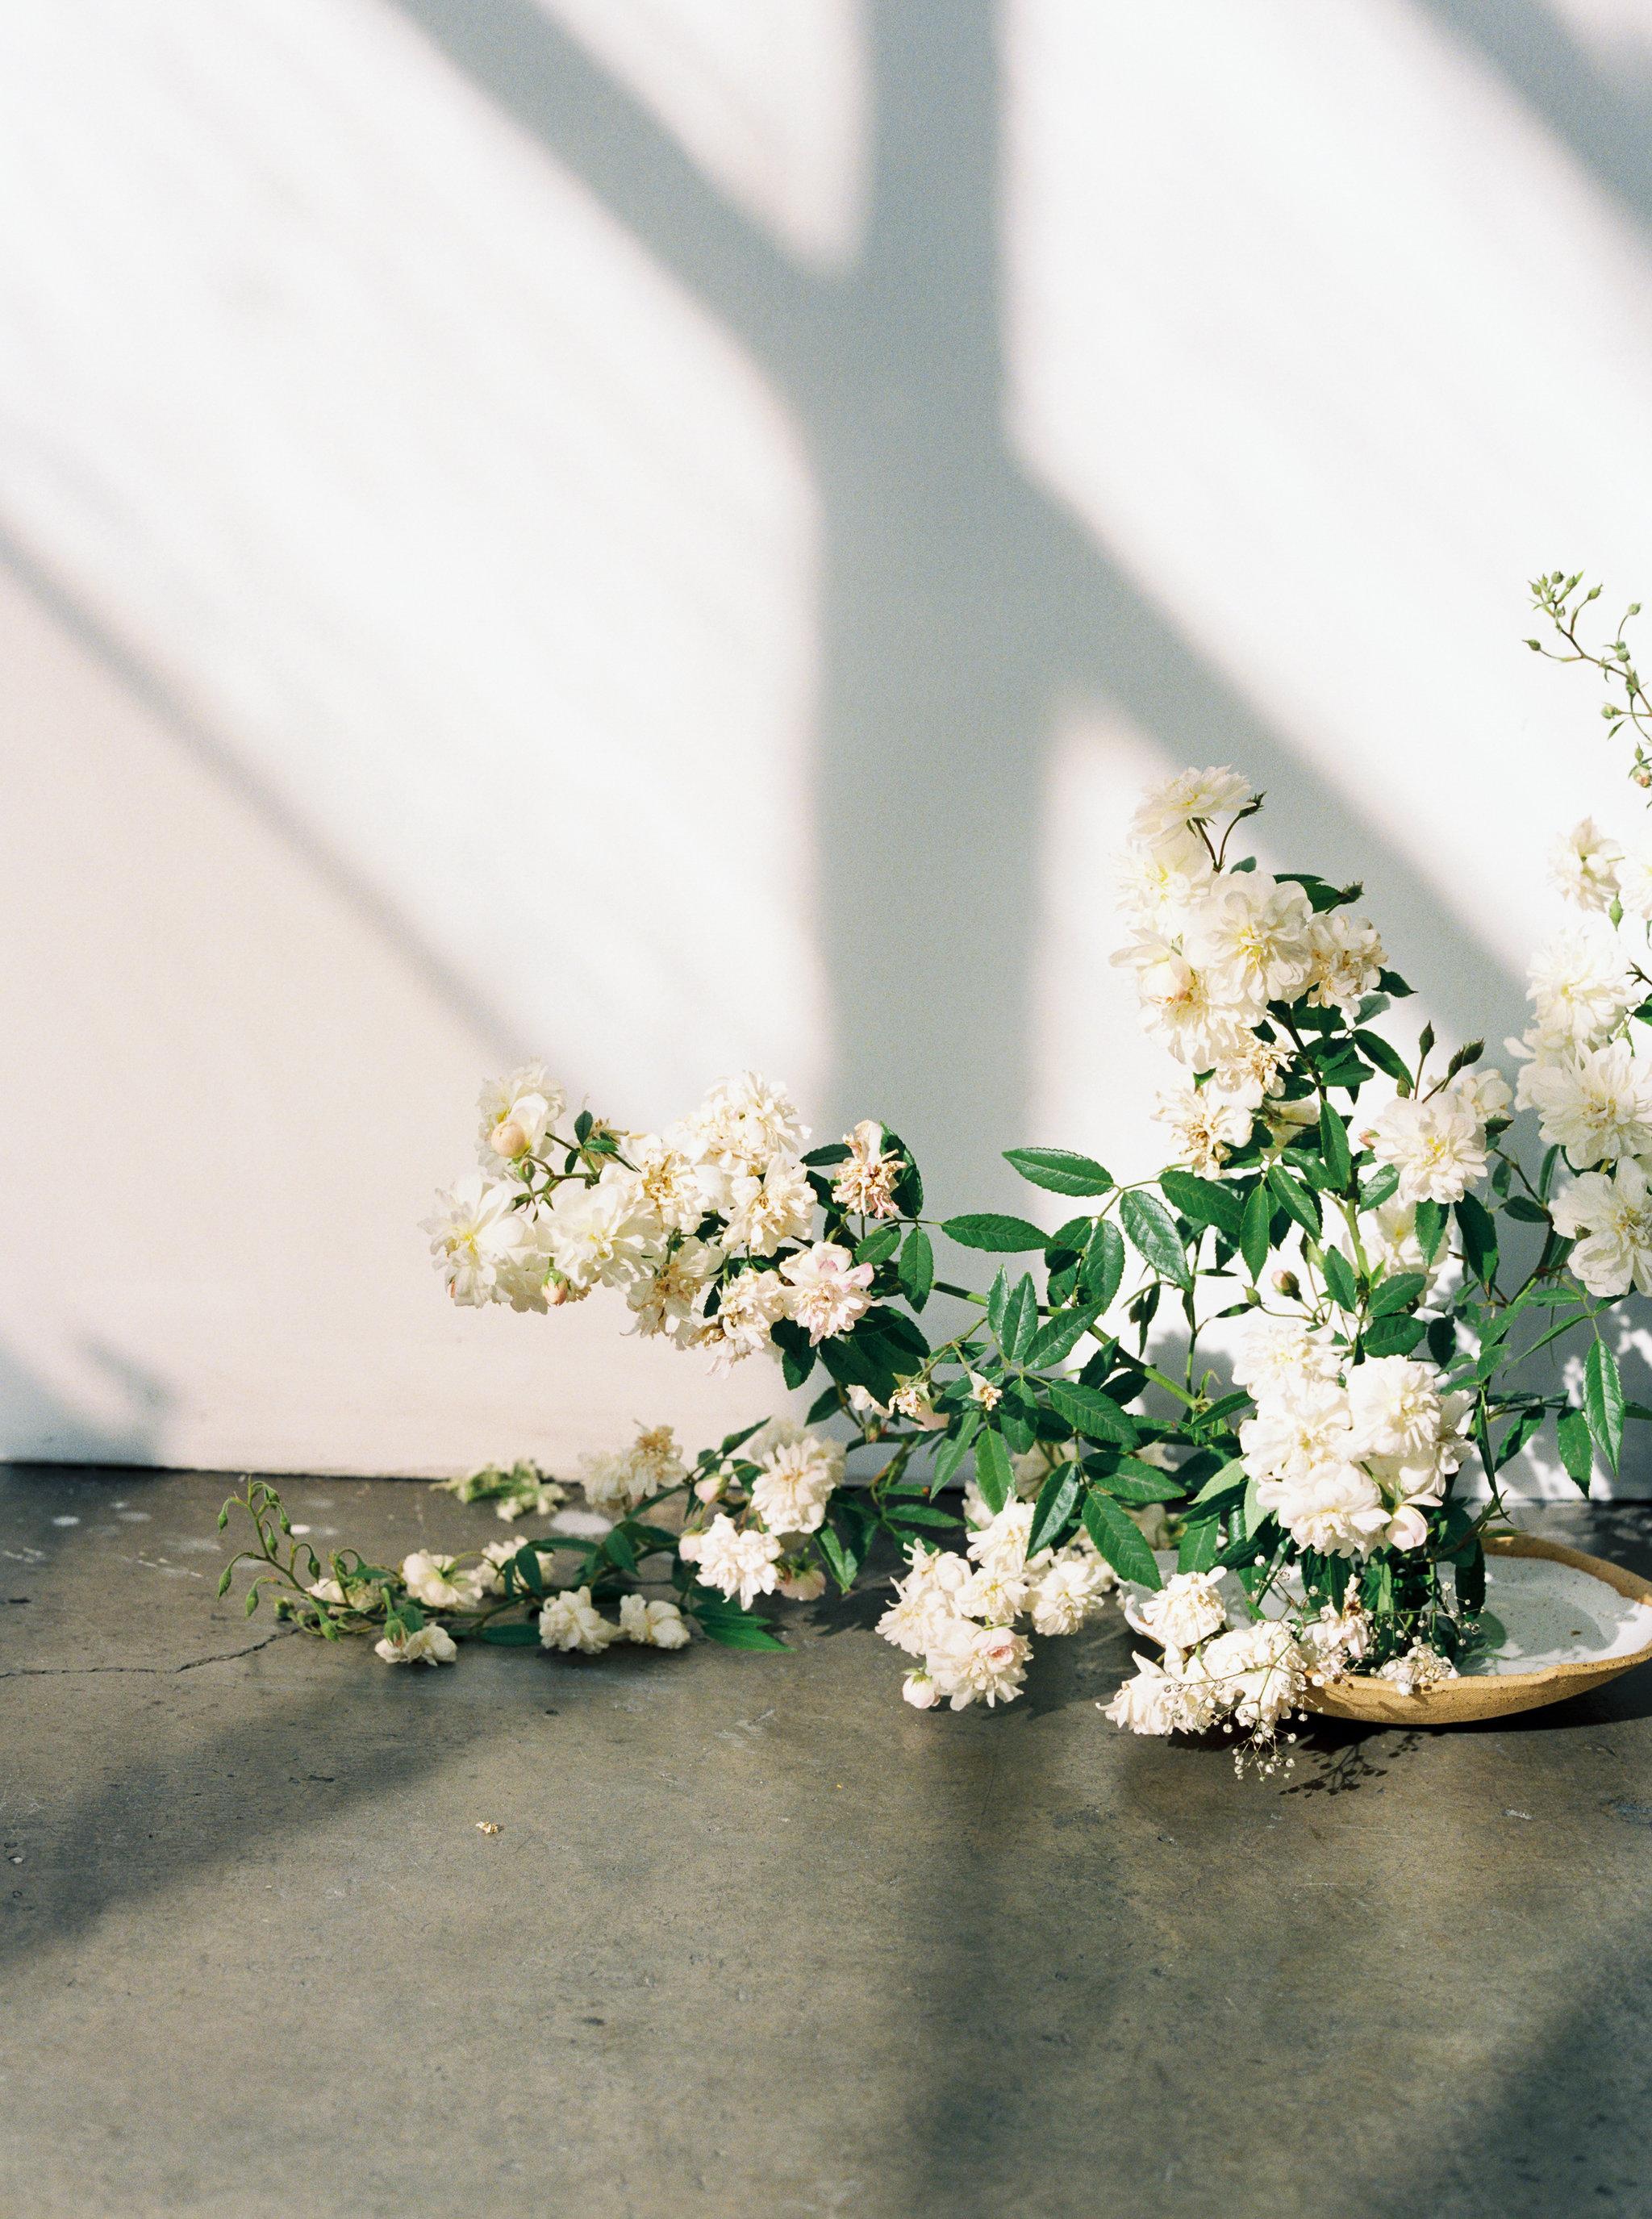 PHOTO CREDIT |  meiwen wang photography